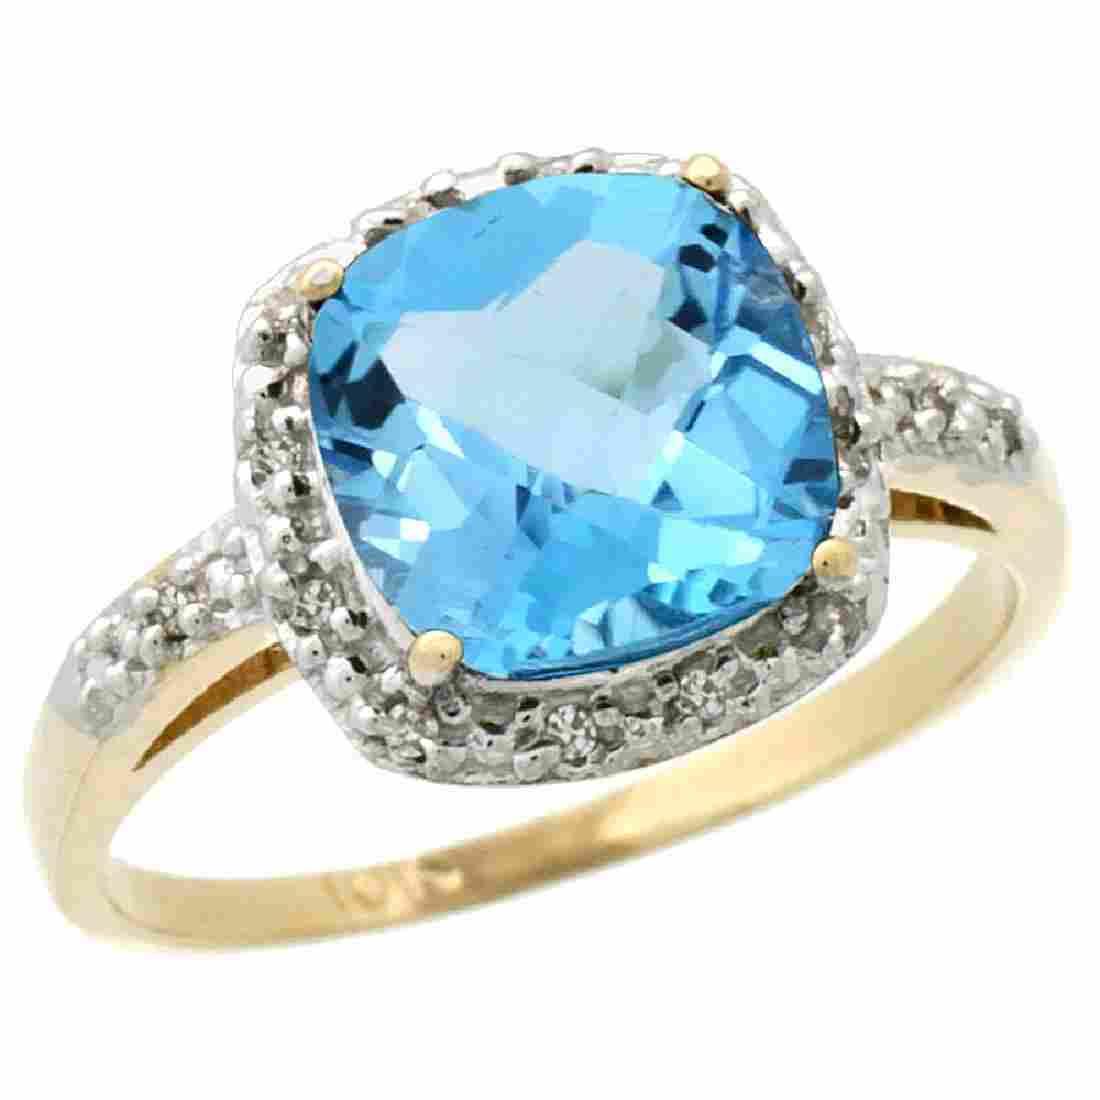 Natural 3.92 ctw Swiss-blue-topaz & Diamond Engagement